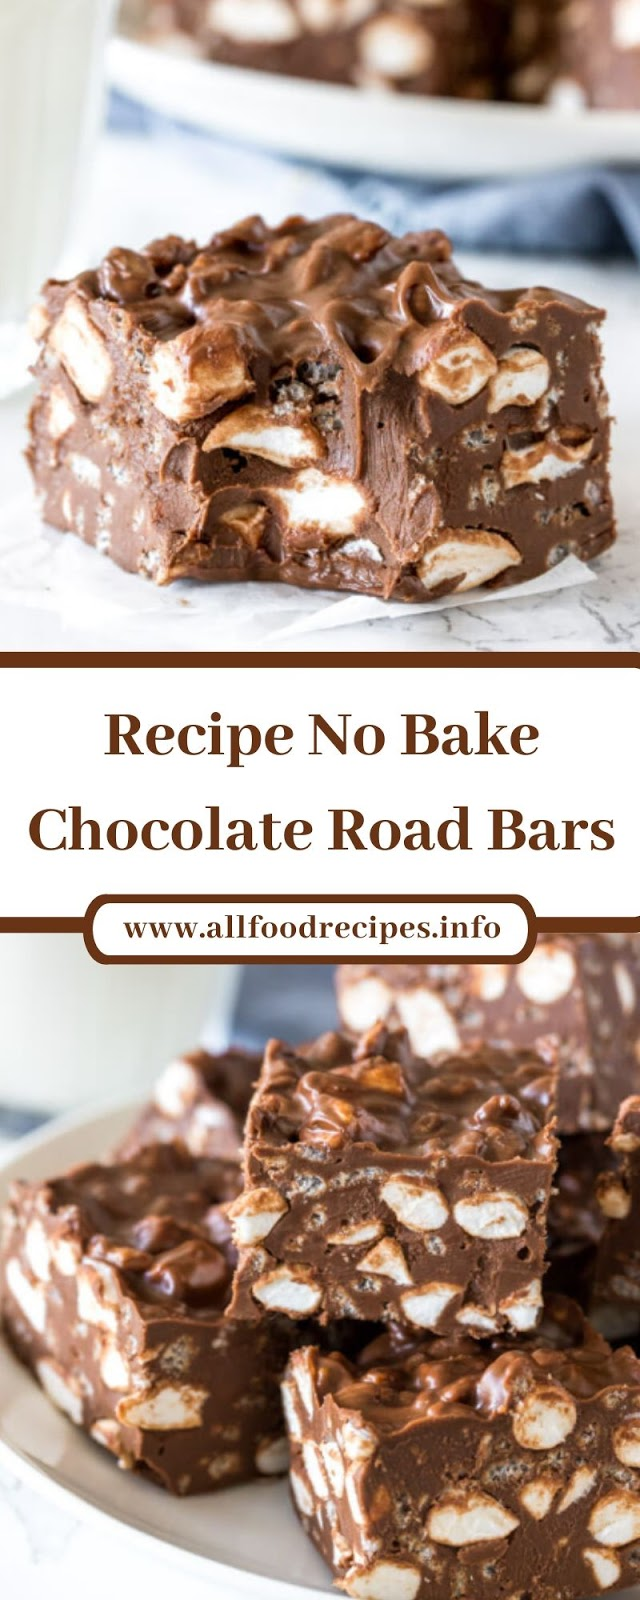 Recipe No Bake Chocolate Road Bars